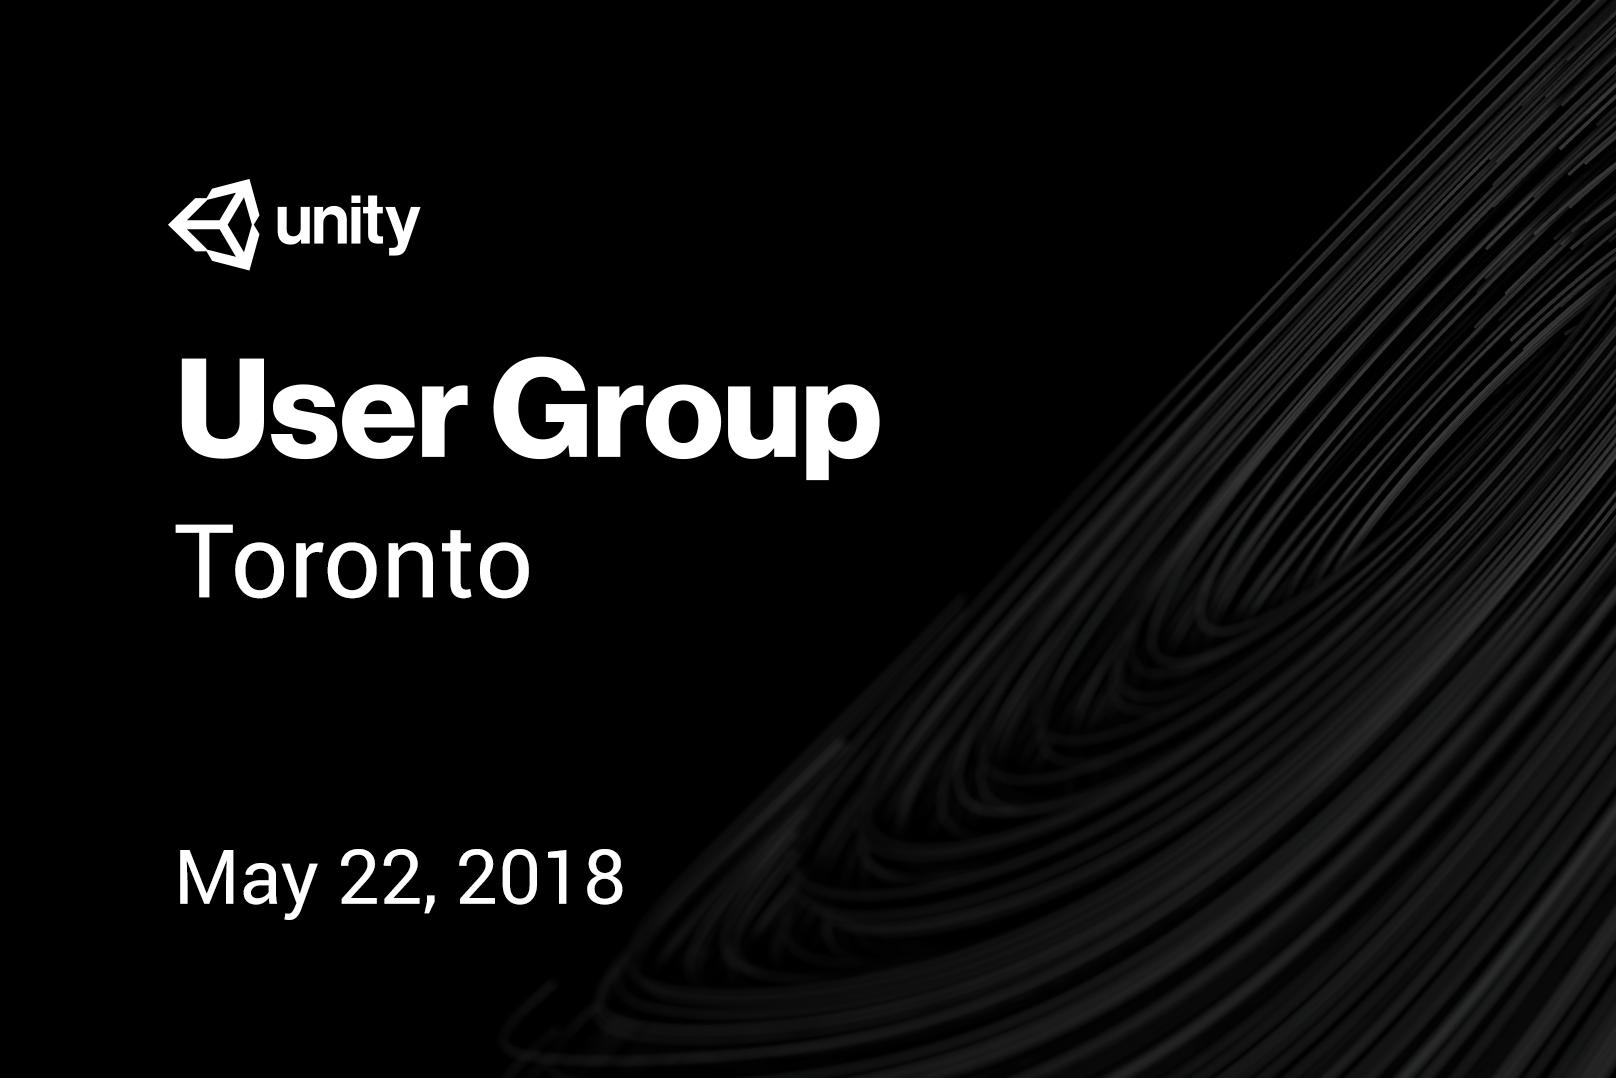 Unity User Group: Toronto